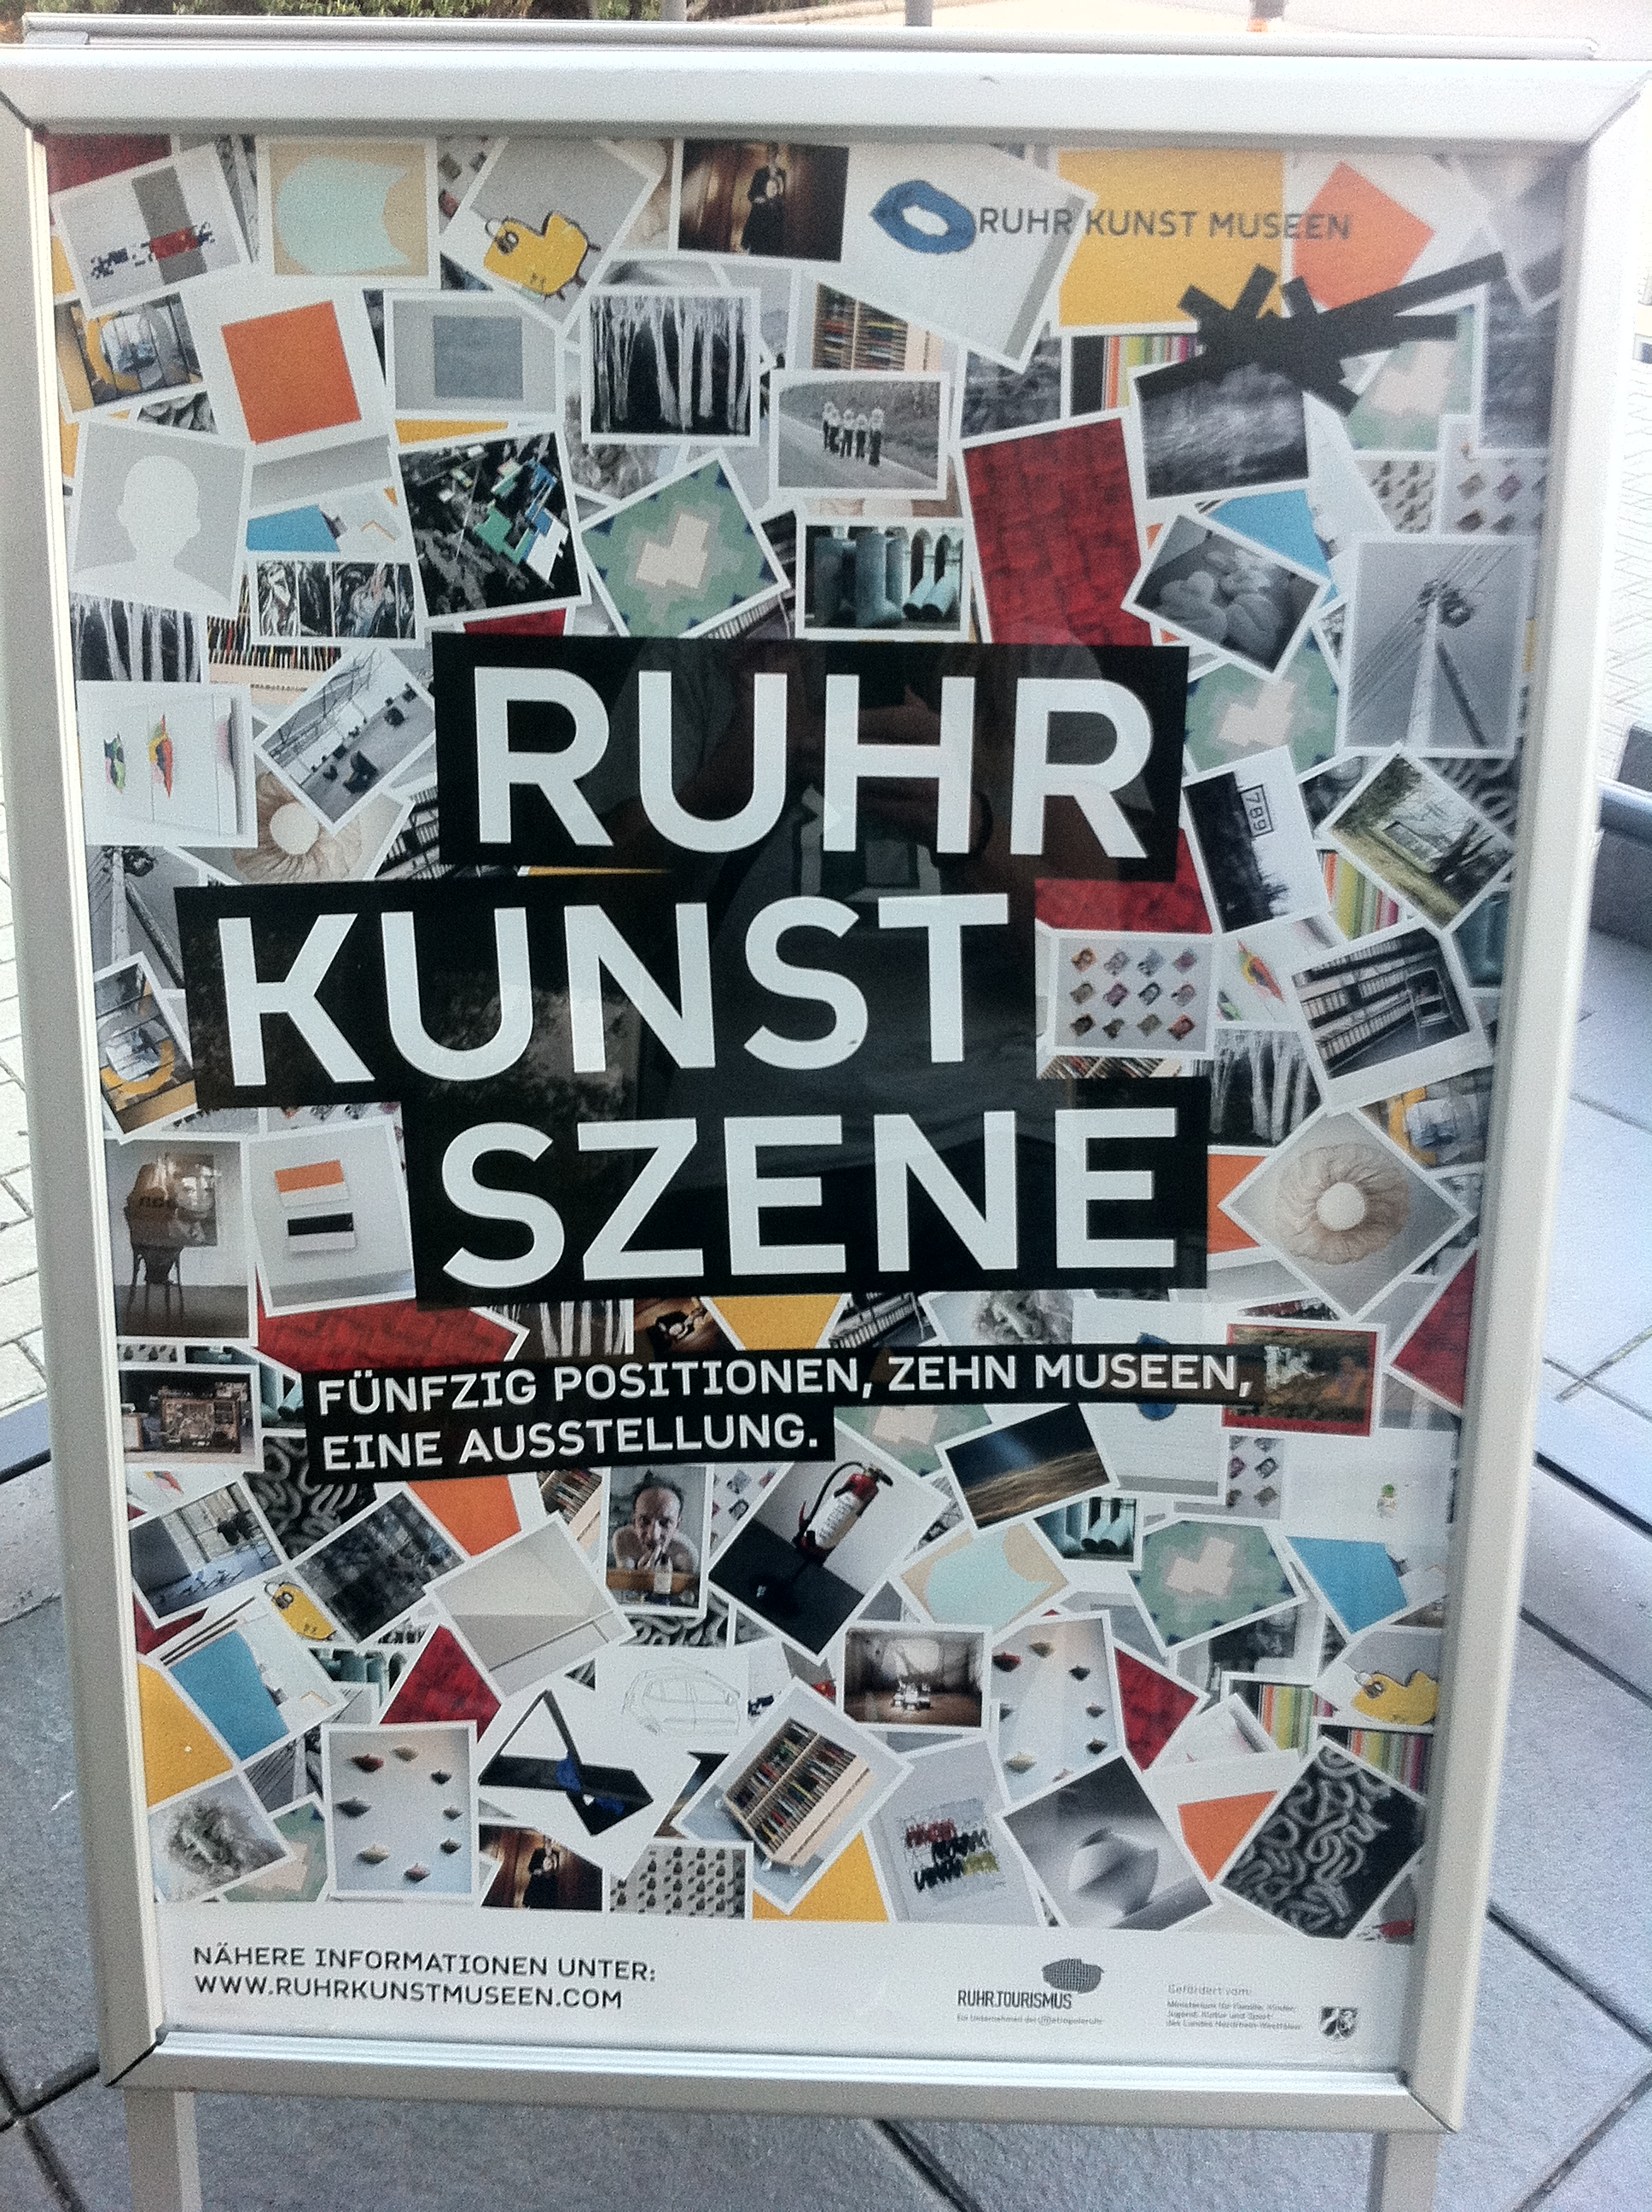 RuhrKunstSzene mit HUkultur mobil